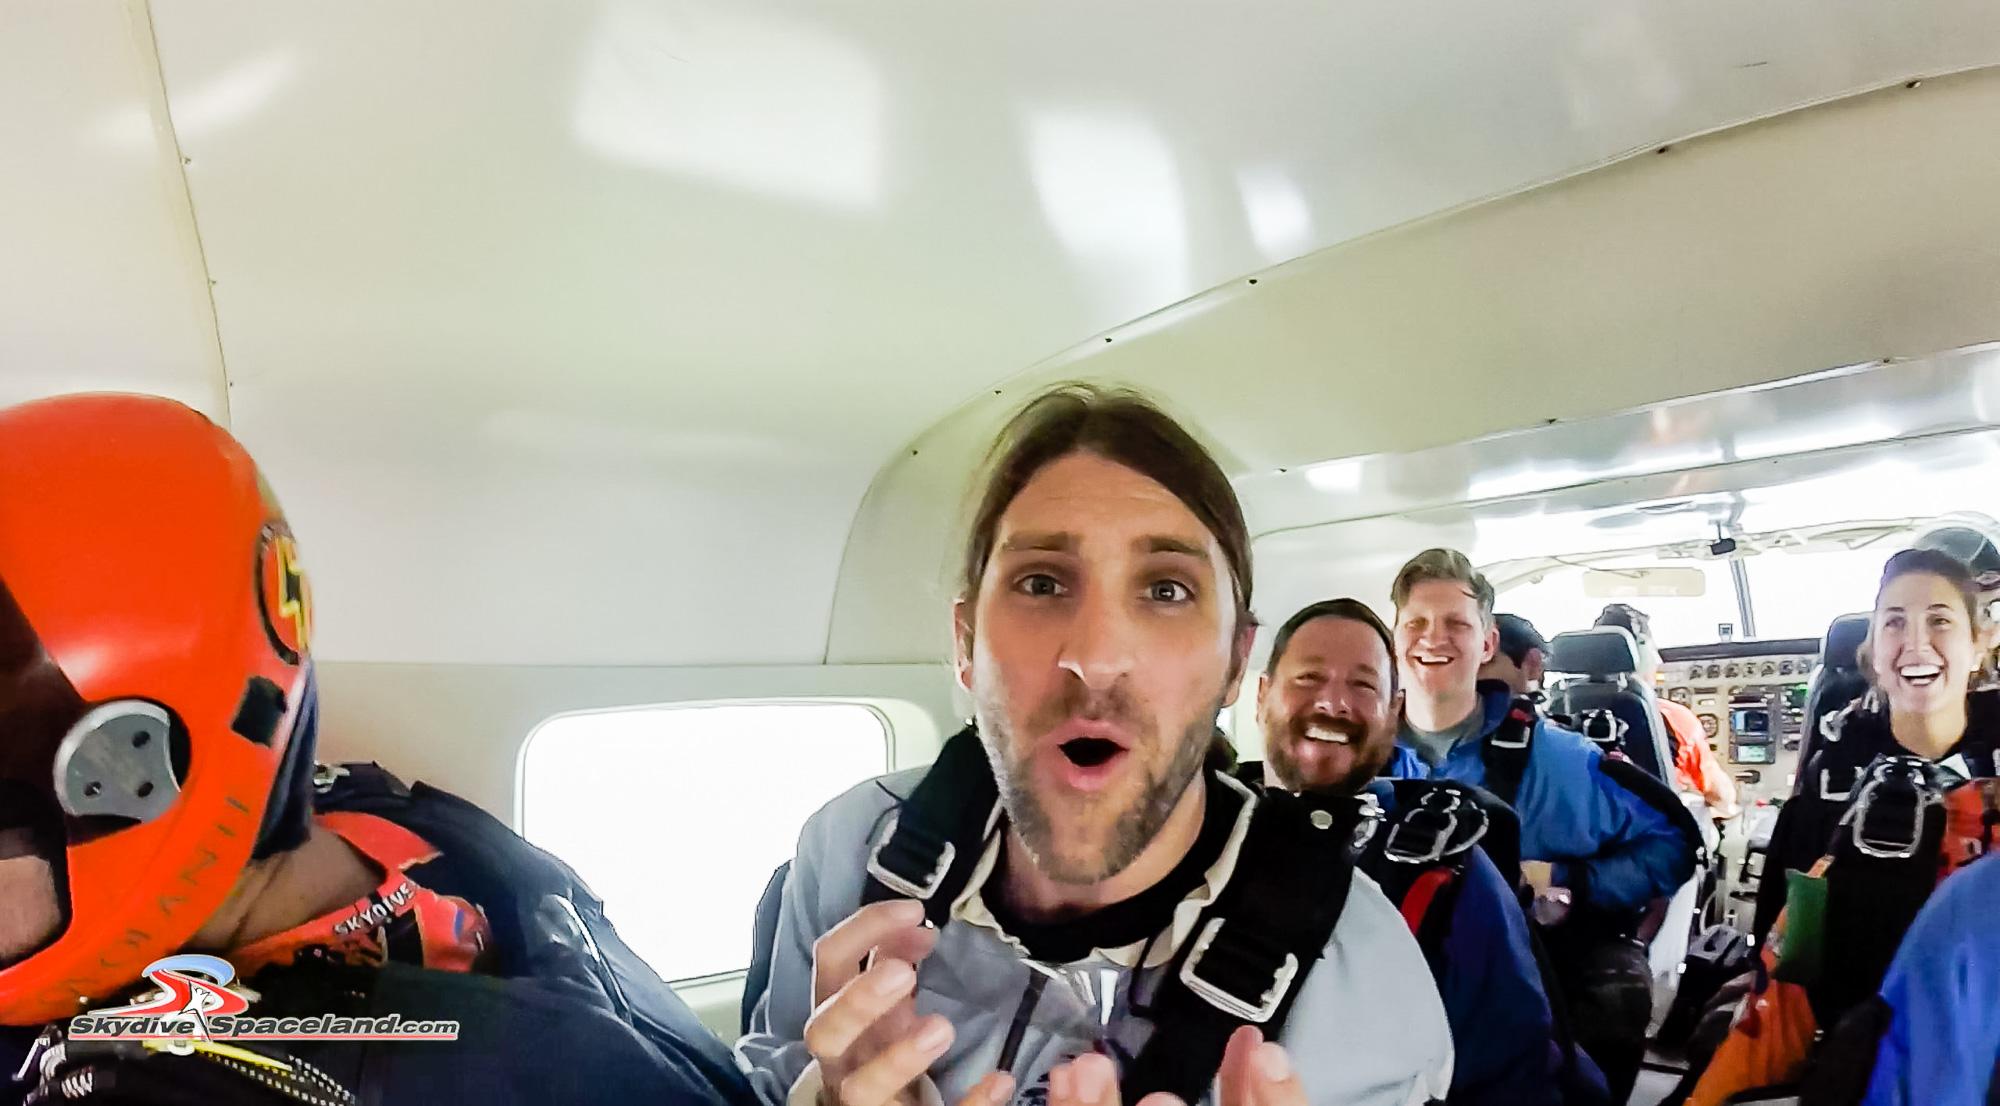 Skydiving Day-Video Screenshots-0010.jpg